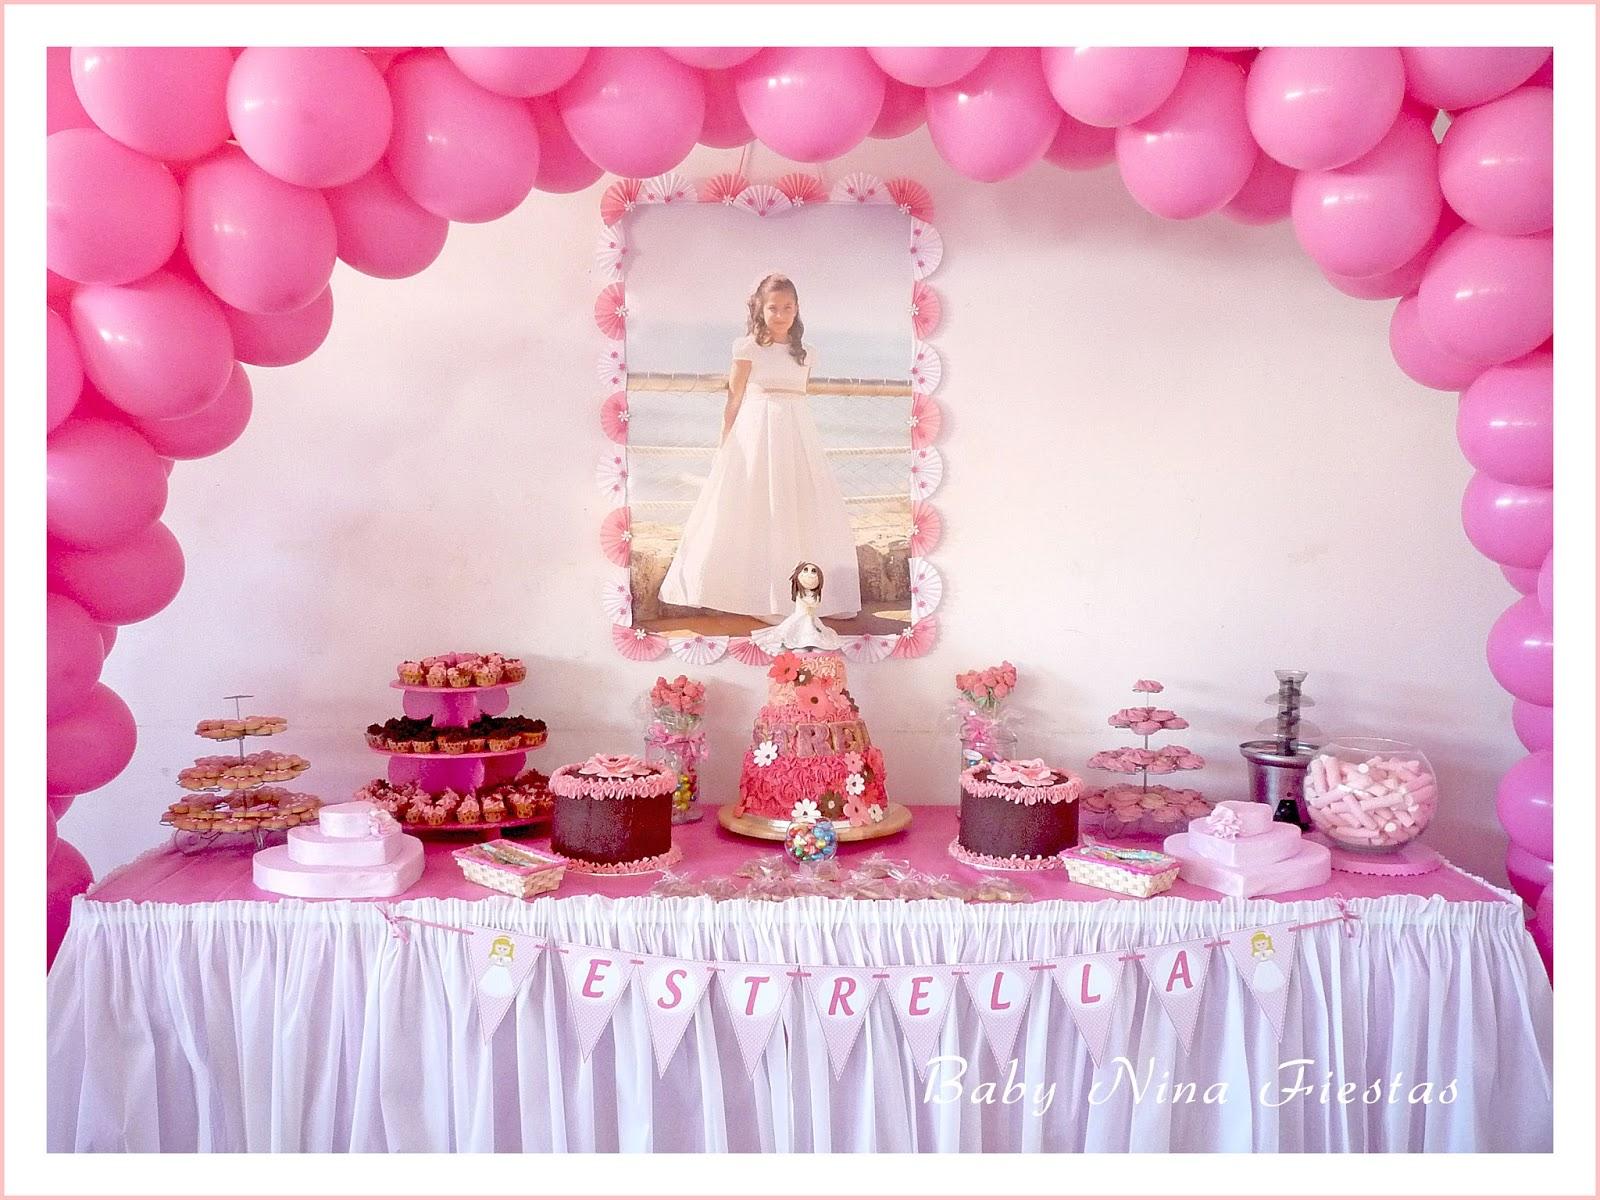 Baby nina fiestas decoraci n comuni n estrella for Decoracion mesa comunion nina